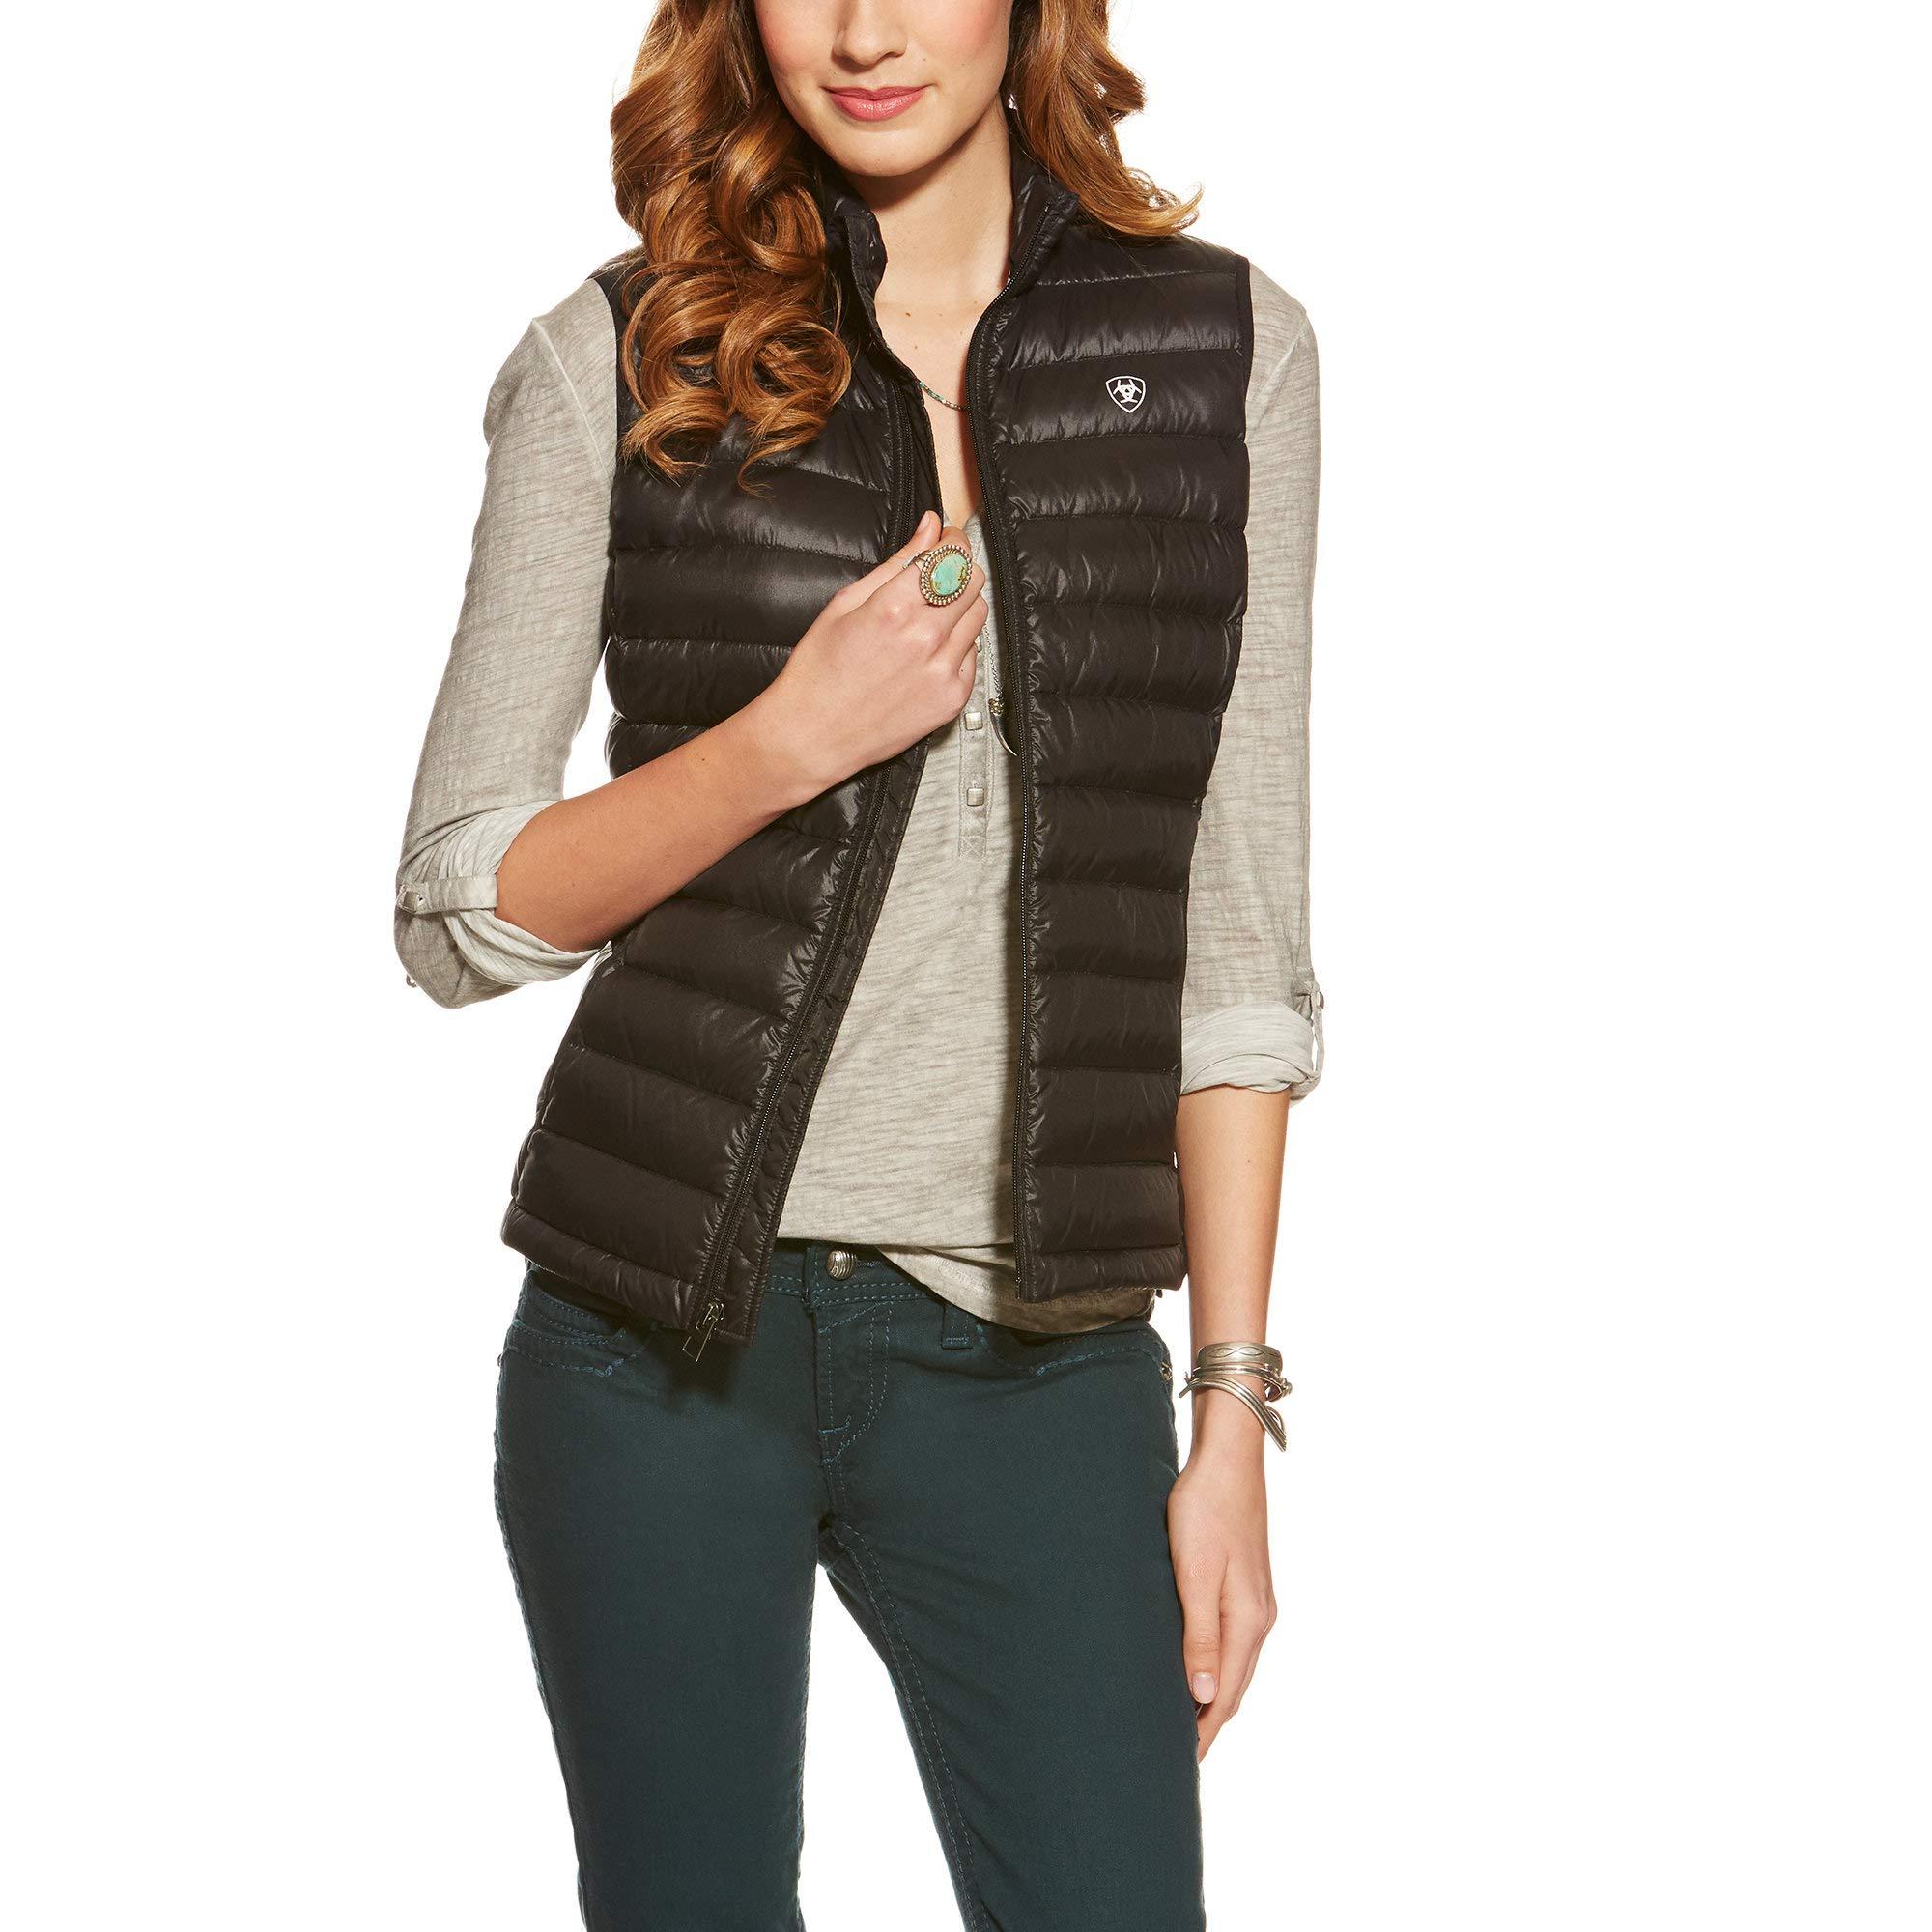 Ariat Women's Ideal Down Vest, Black, X-Large by ARIAT